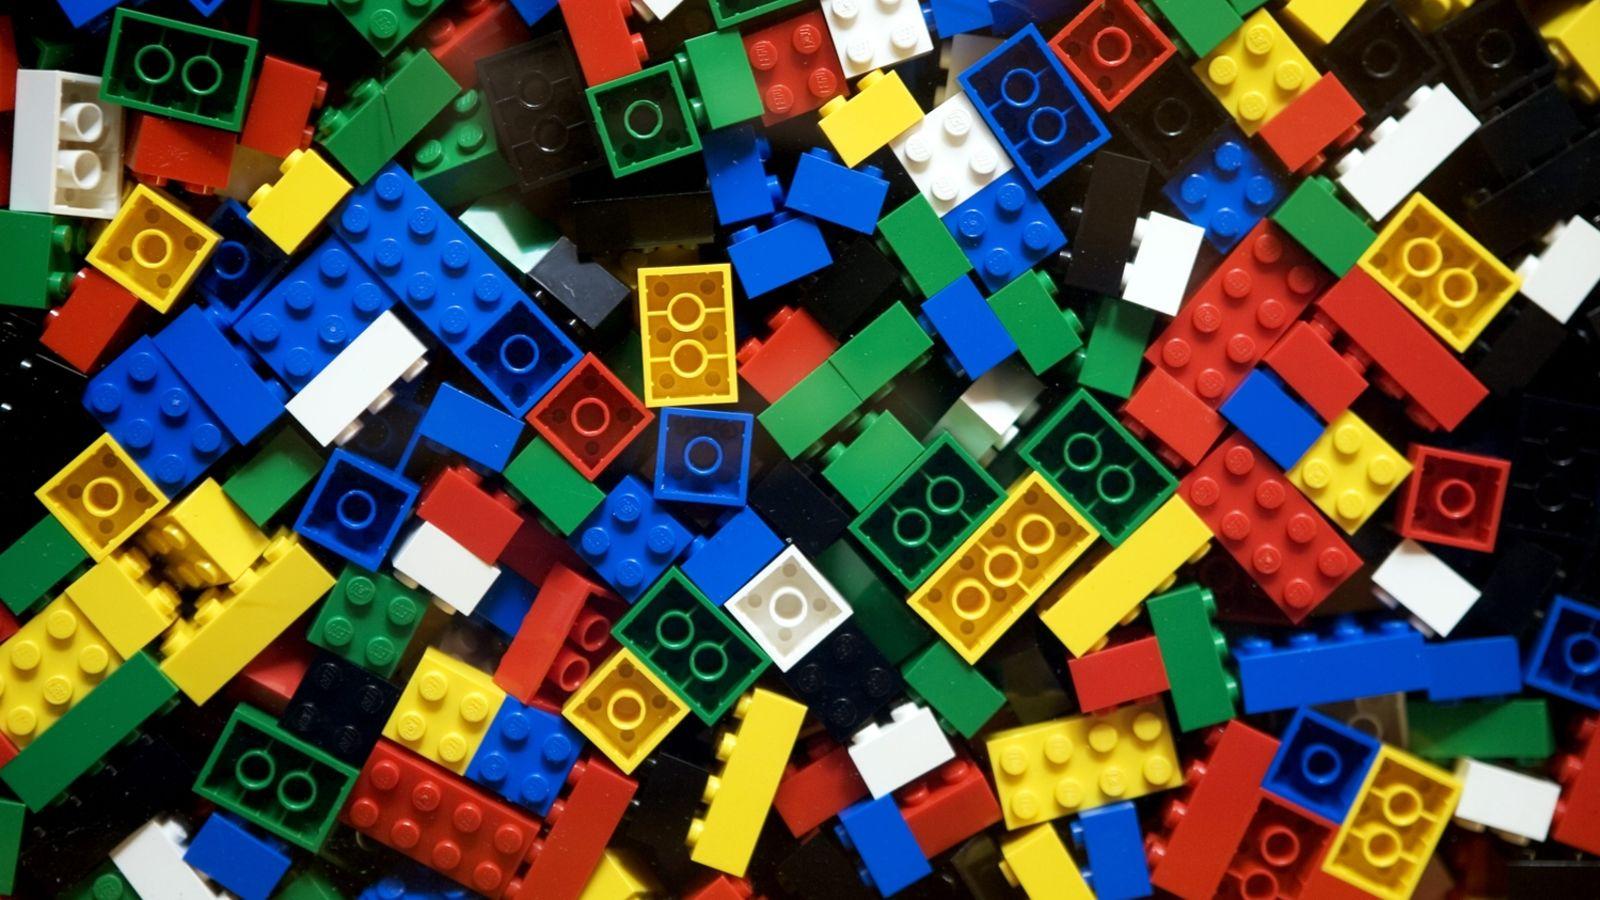 Los juguetes Lego